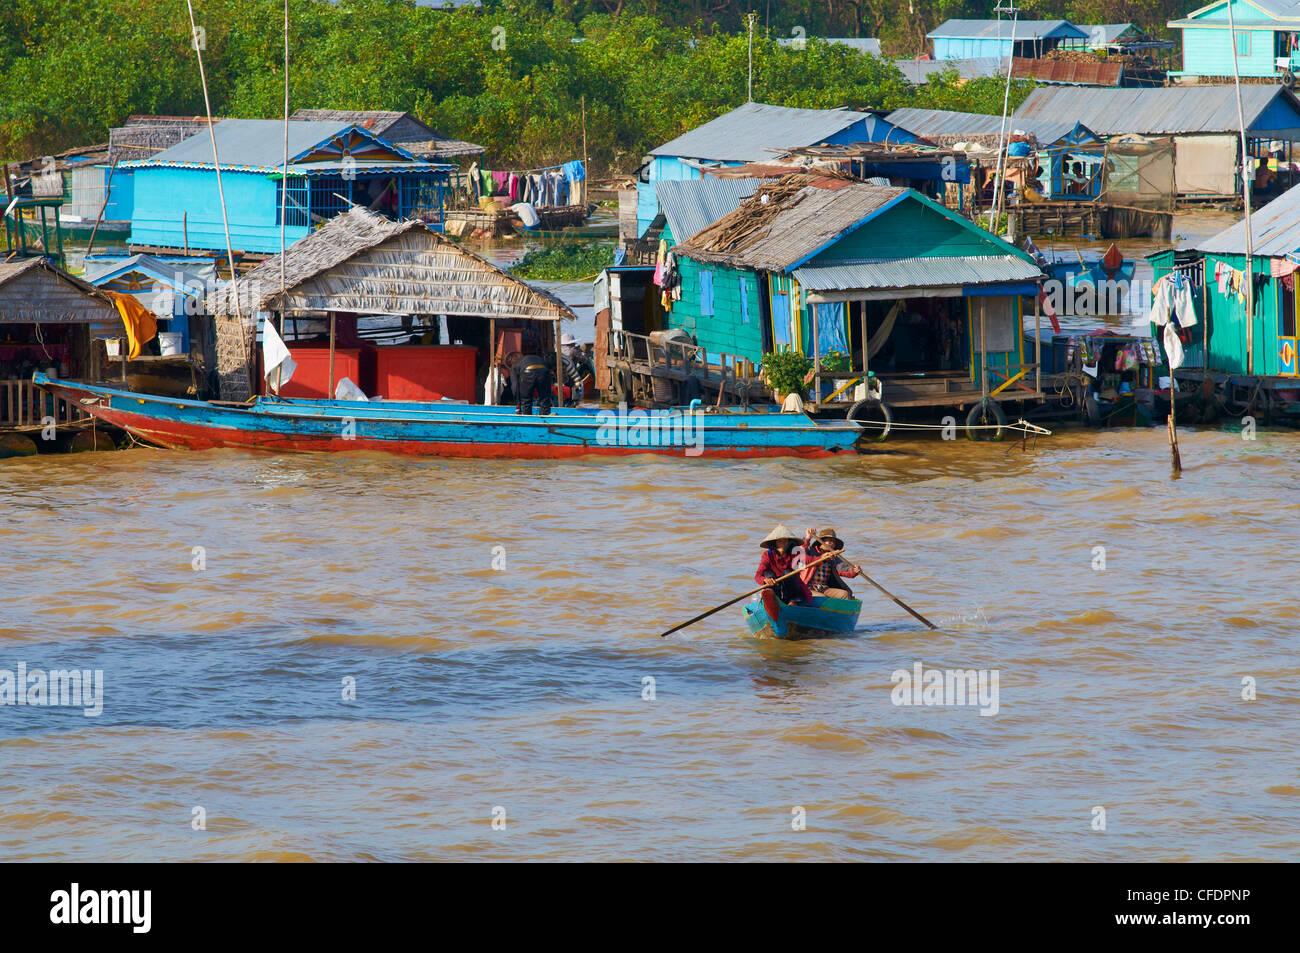 Floating Vietnamese village, Lake Tonle Sap, Biosphere Reserve of UNESCO, Siem Reap, Cambodia, Indochina, Southeast - Stock Image